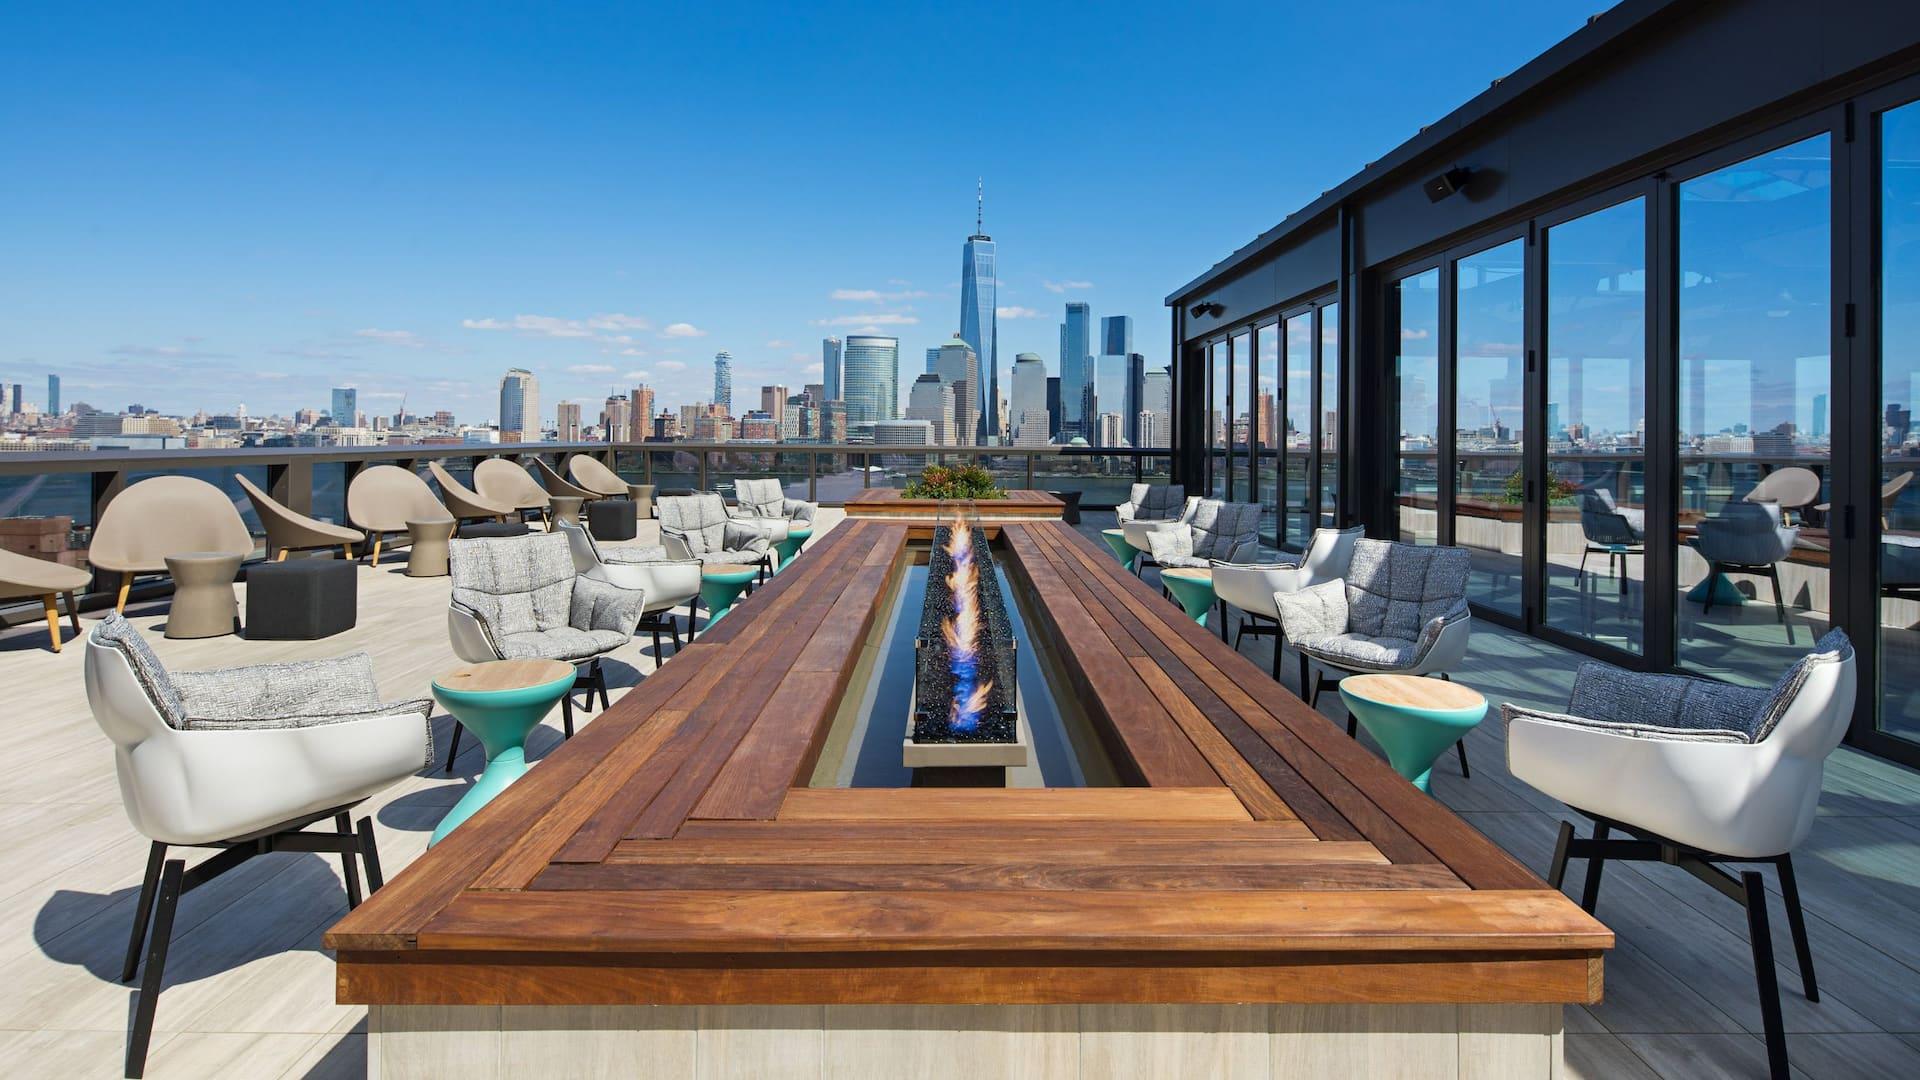 Hyatt House Jersey City Rooftop